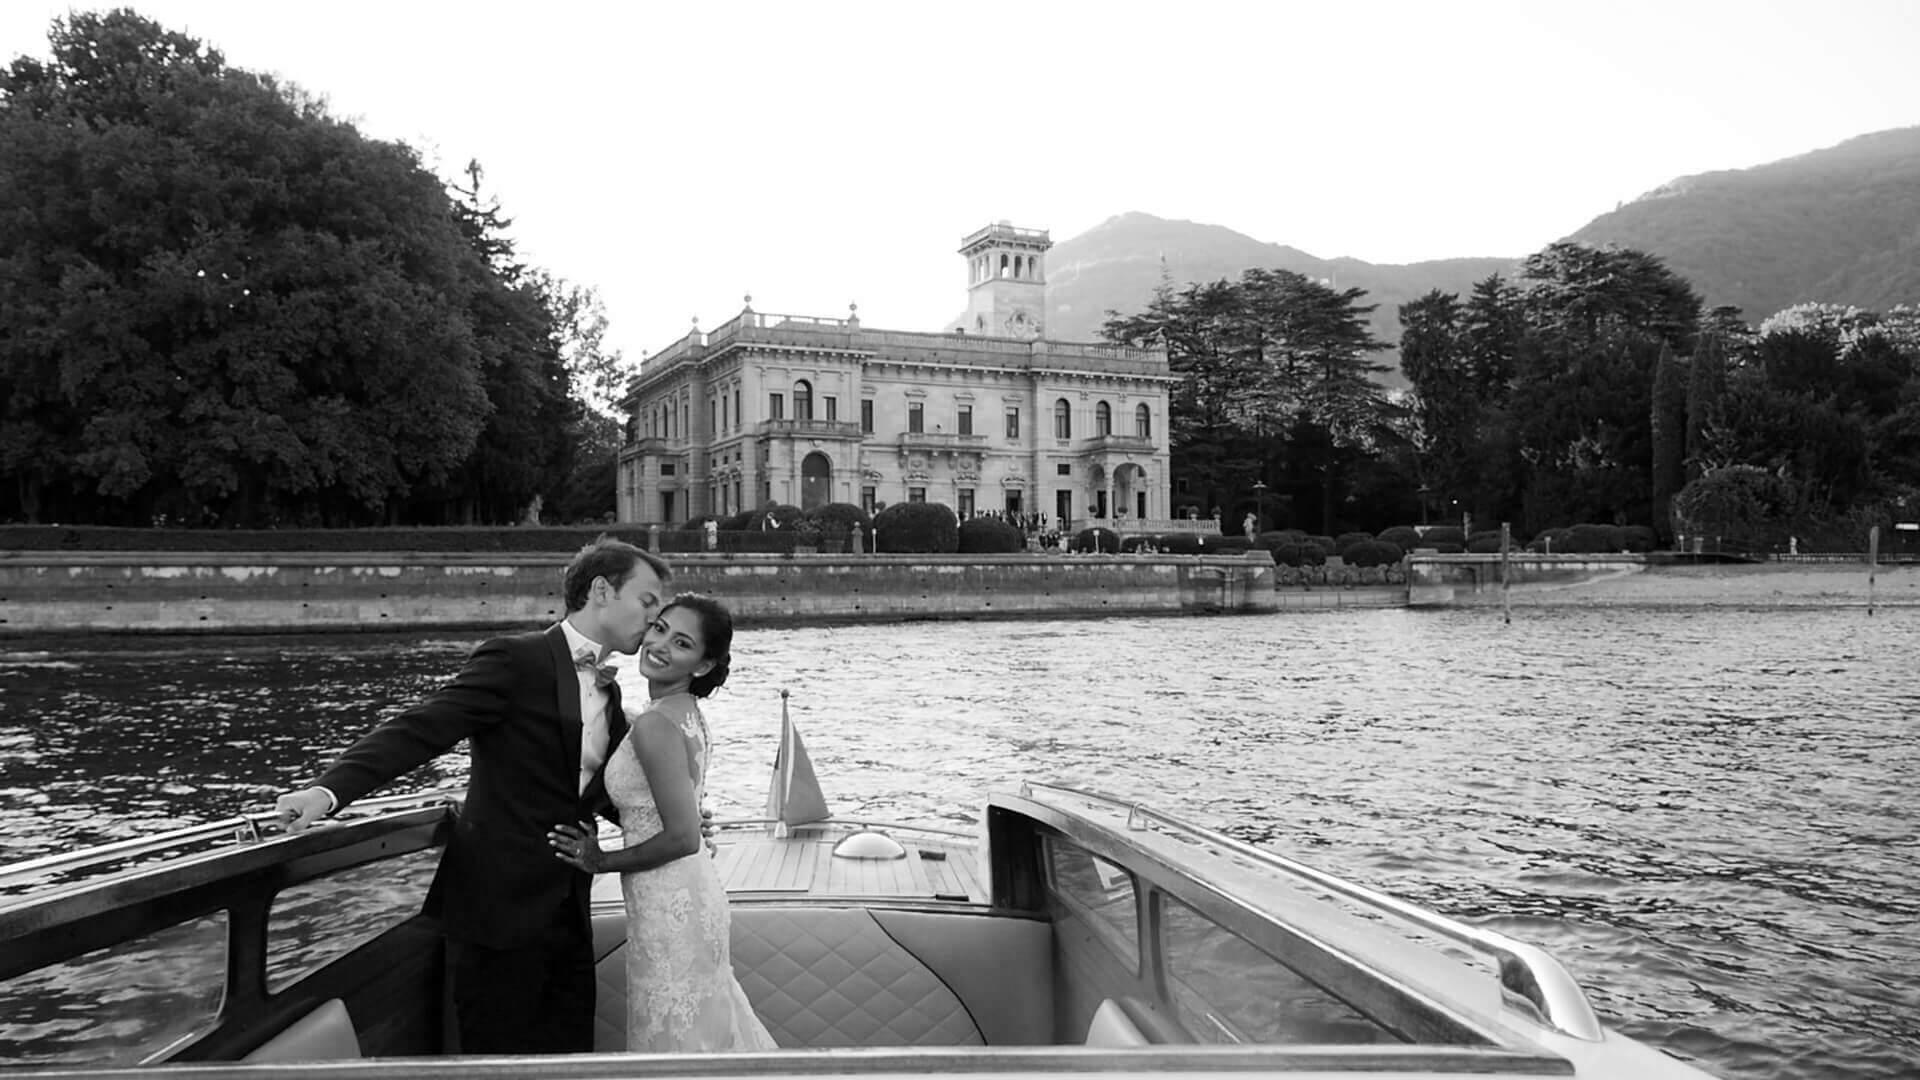 sposa-sposo-villa-erba-lago-di-como-journal.jpg